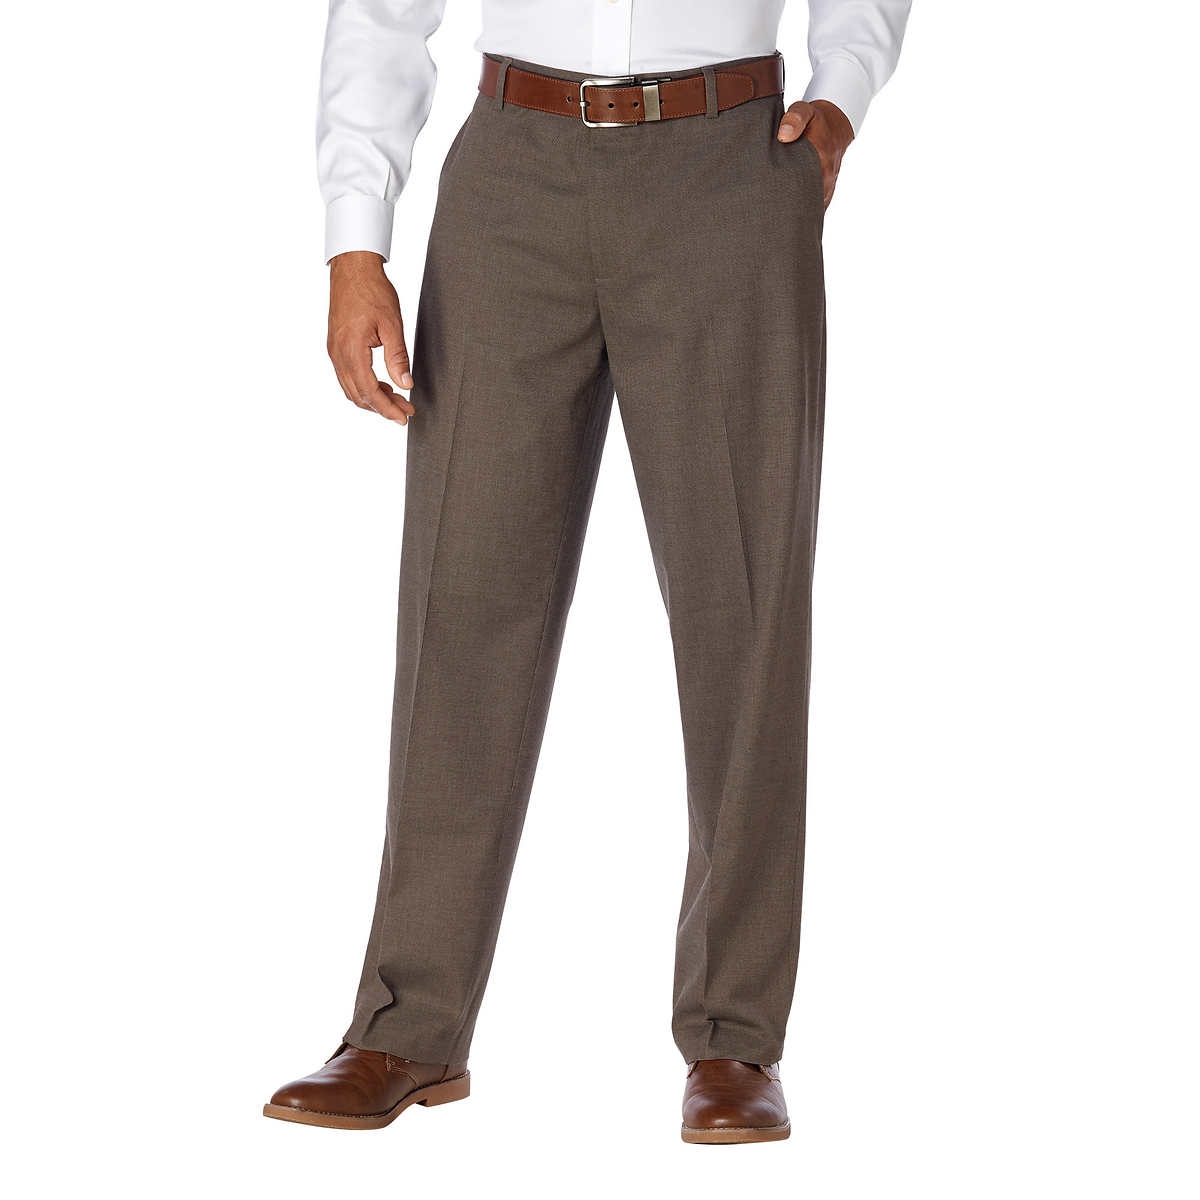 7ed9de05 Kirkland Signature Men's Non-Iron Comfort Pant